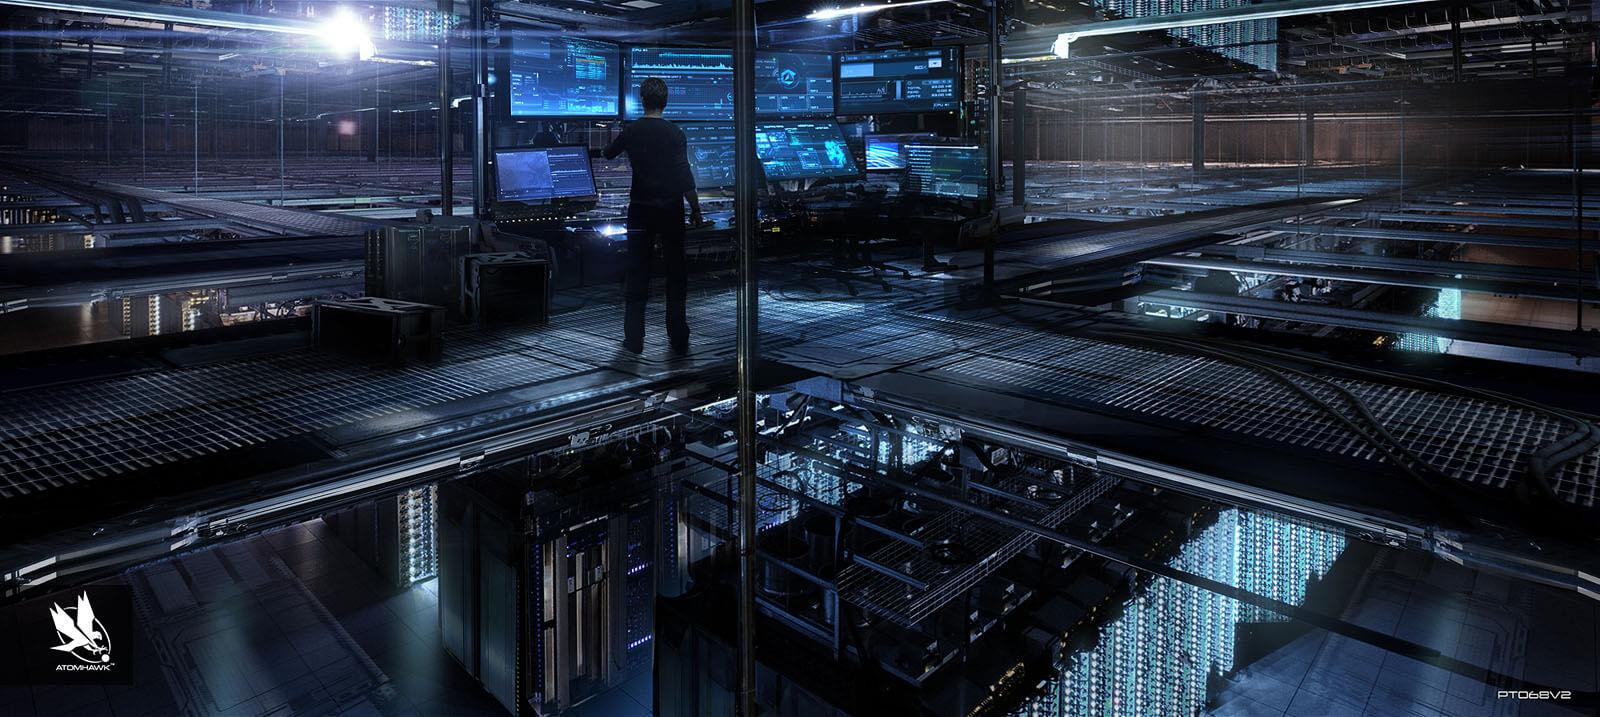 Atomhawk_Marvel_Avengers-Age-Of-Ultron_Concept-Art_Environment-Design_Fortress-Factory-Level3.jpg